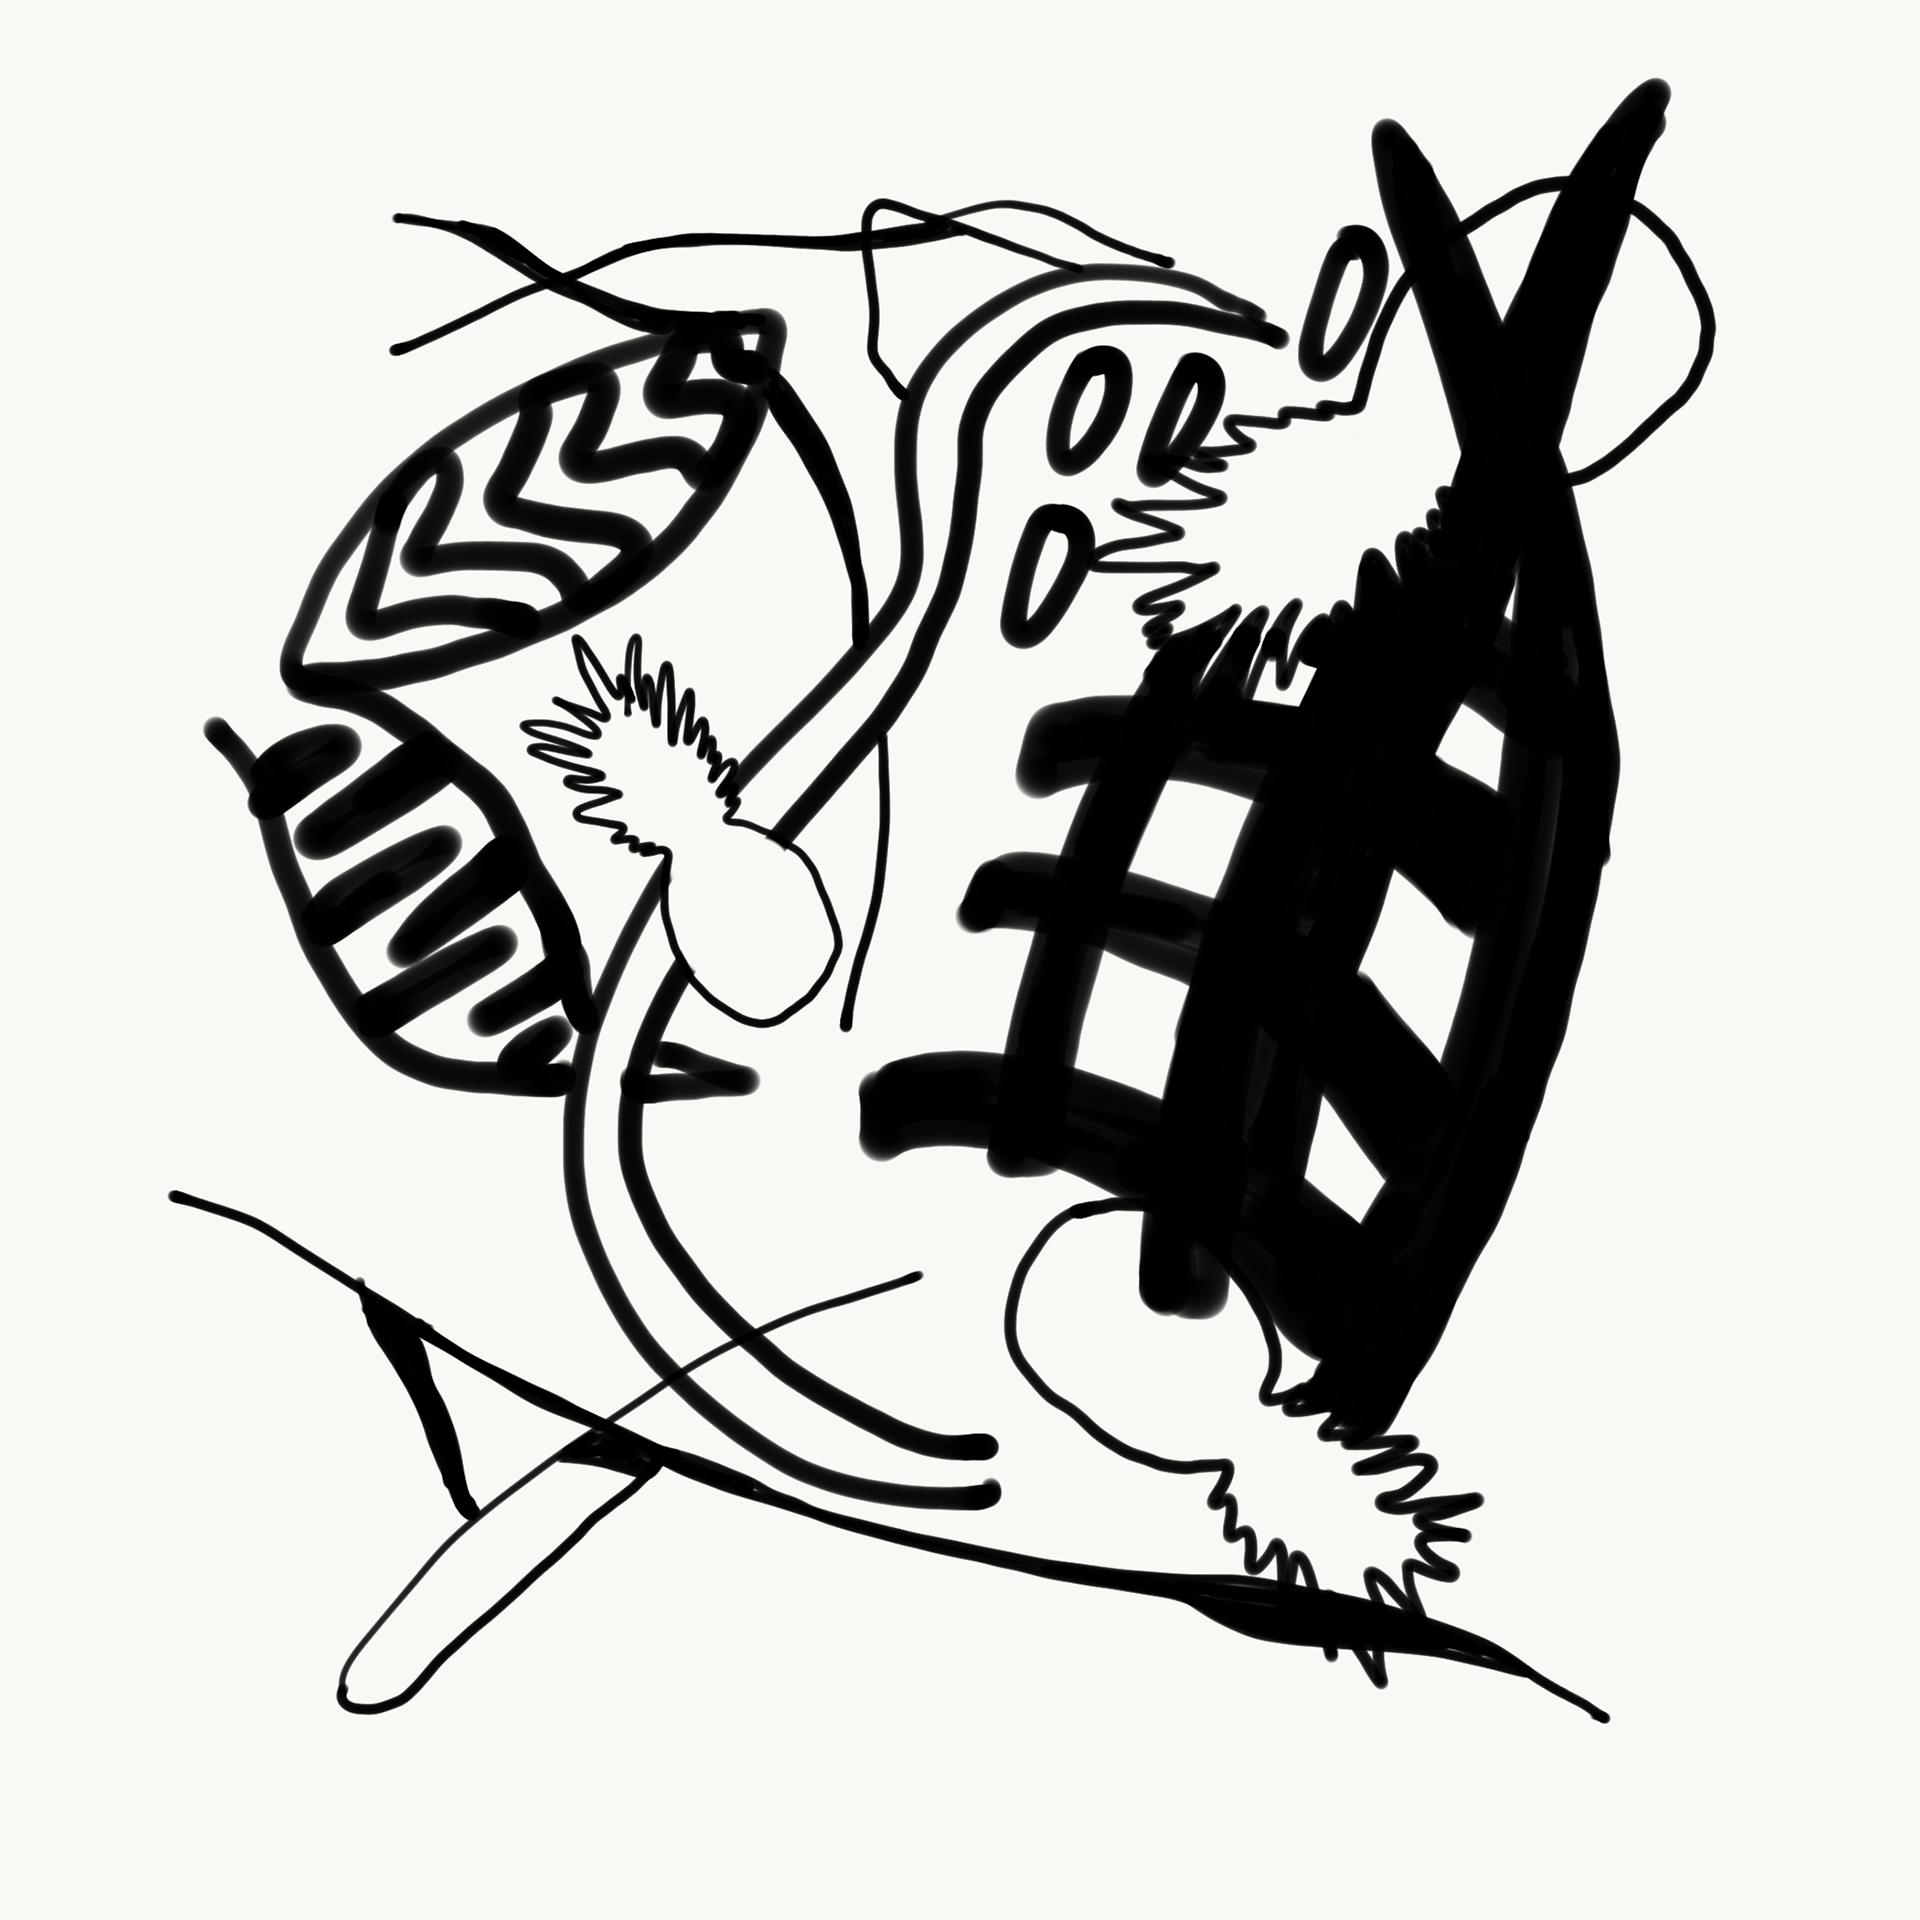 Nicole miller logo clipart clipart black and white stock Izabela Clarke - Embroidered Top Design, Nicole Miller clipart black and white stock